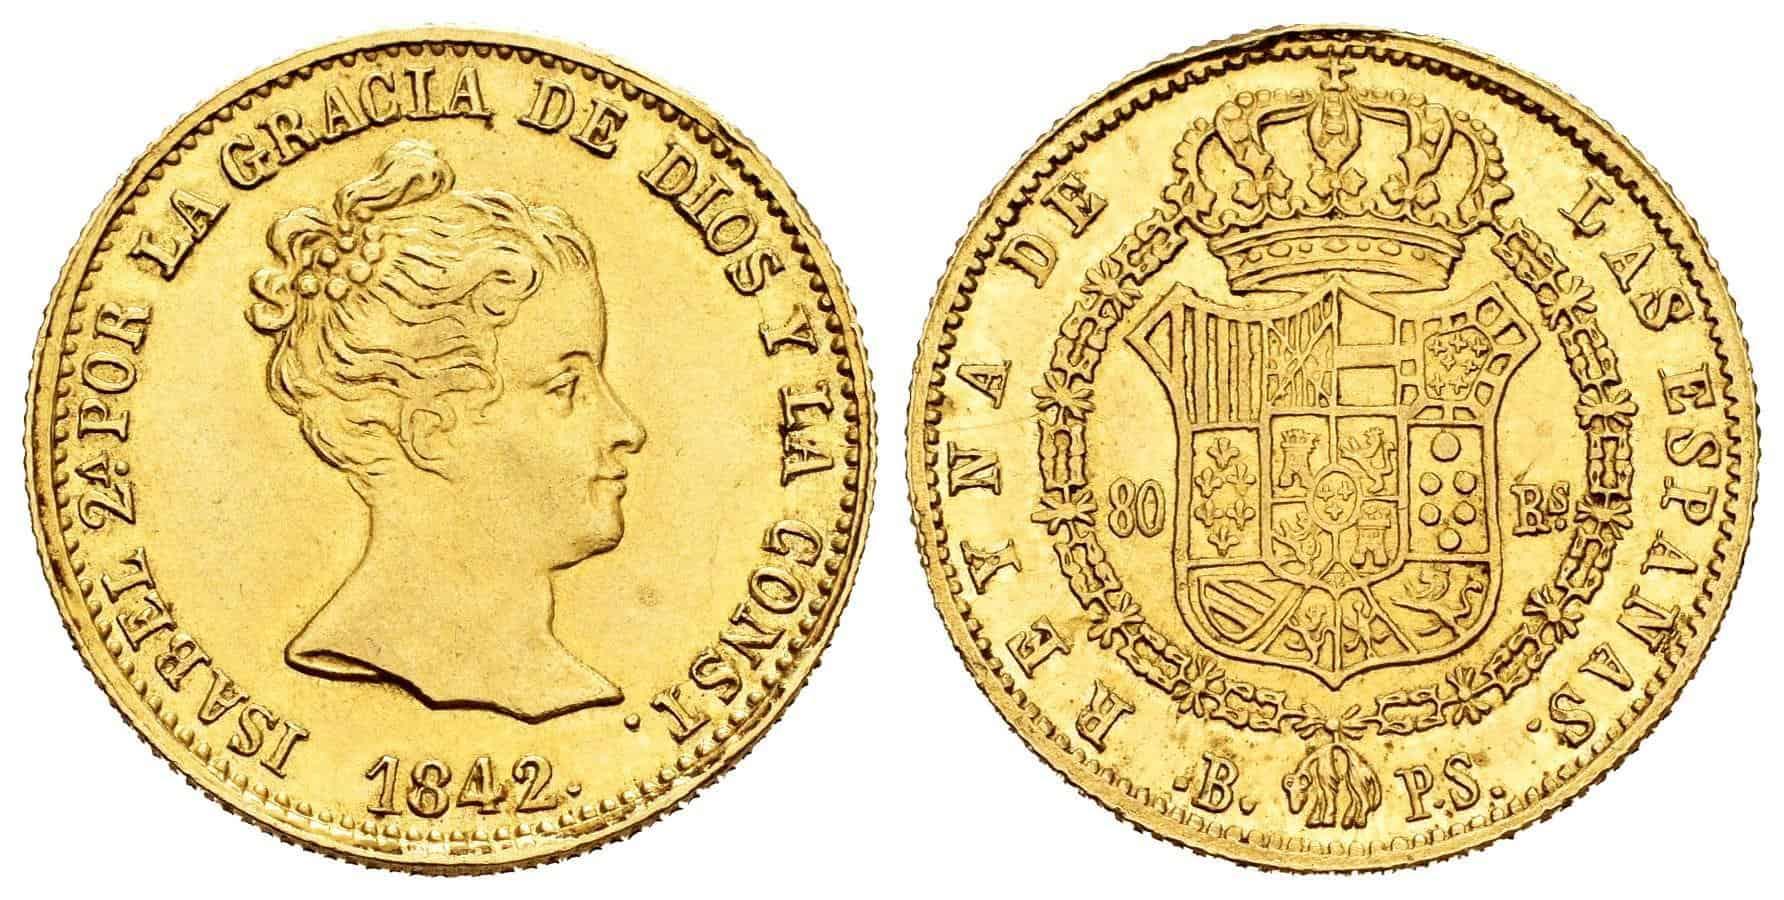 80 reales 1842, Barcelona P.S.